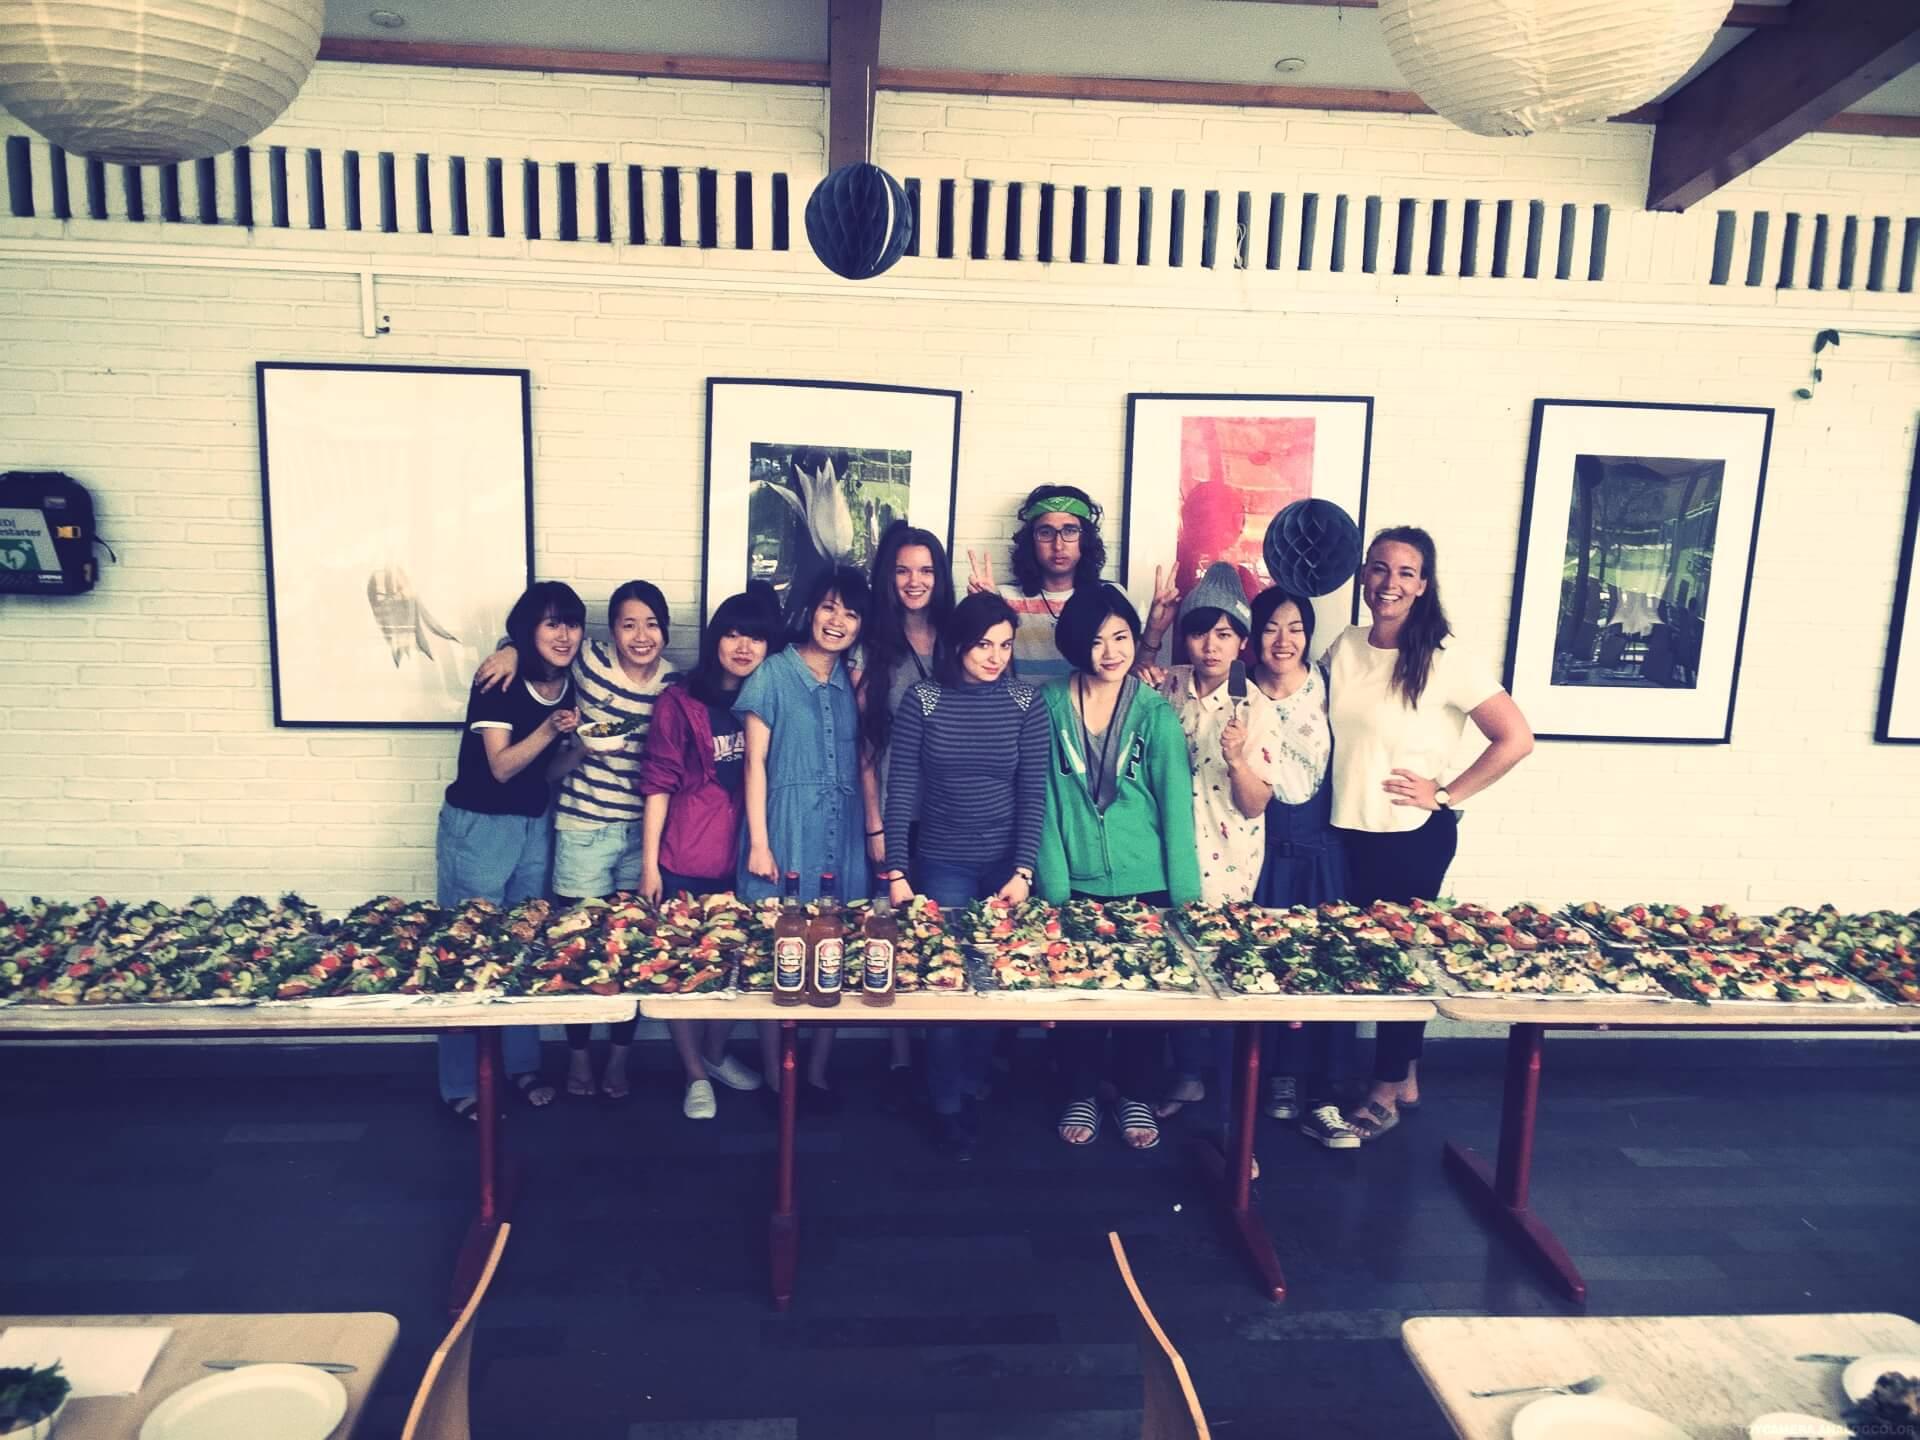 Students prepared Folk High School Danish lunch at International People's College